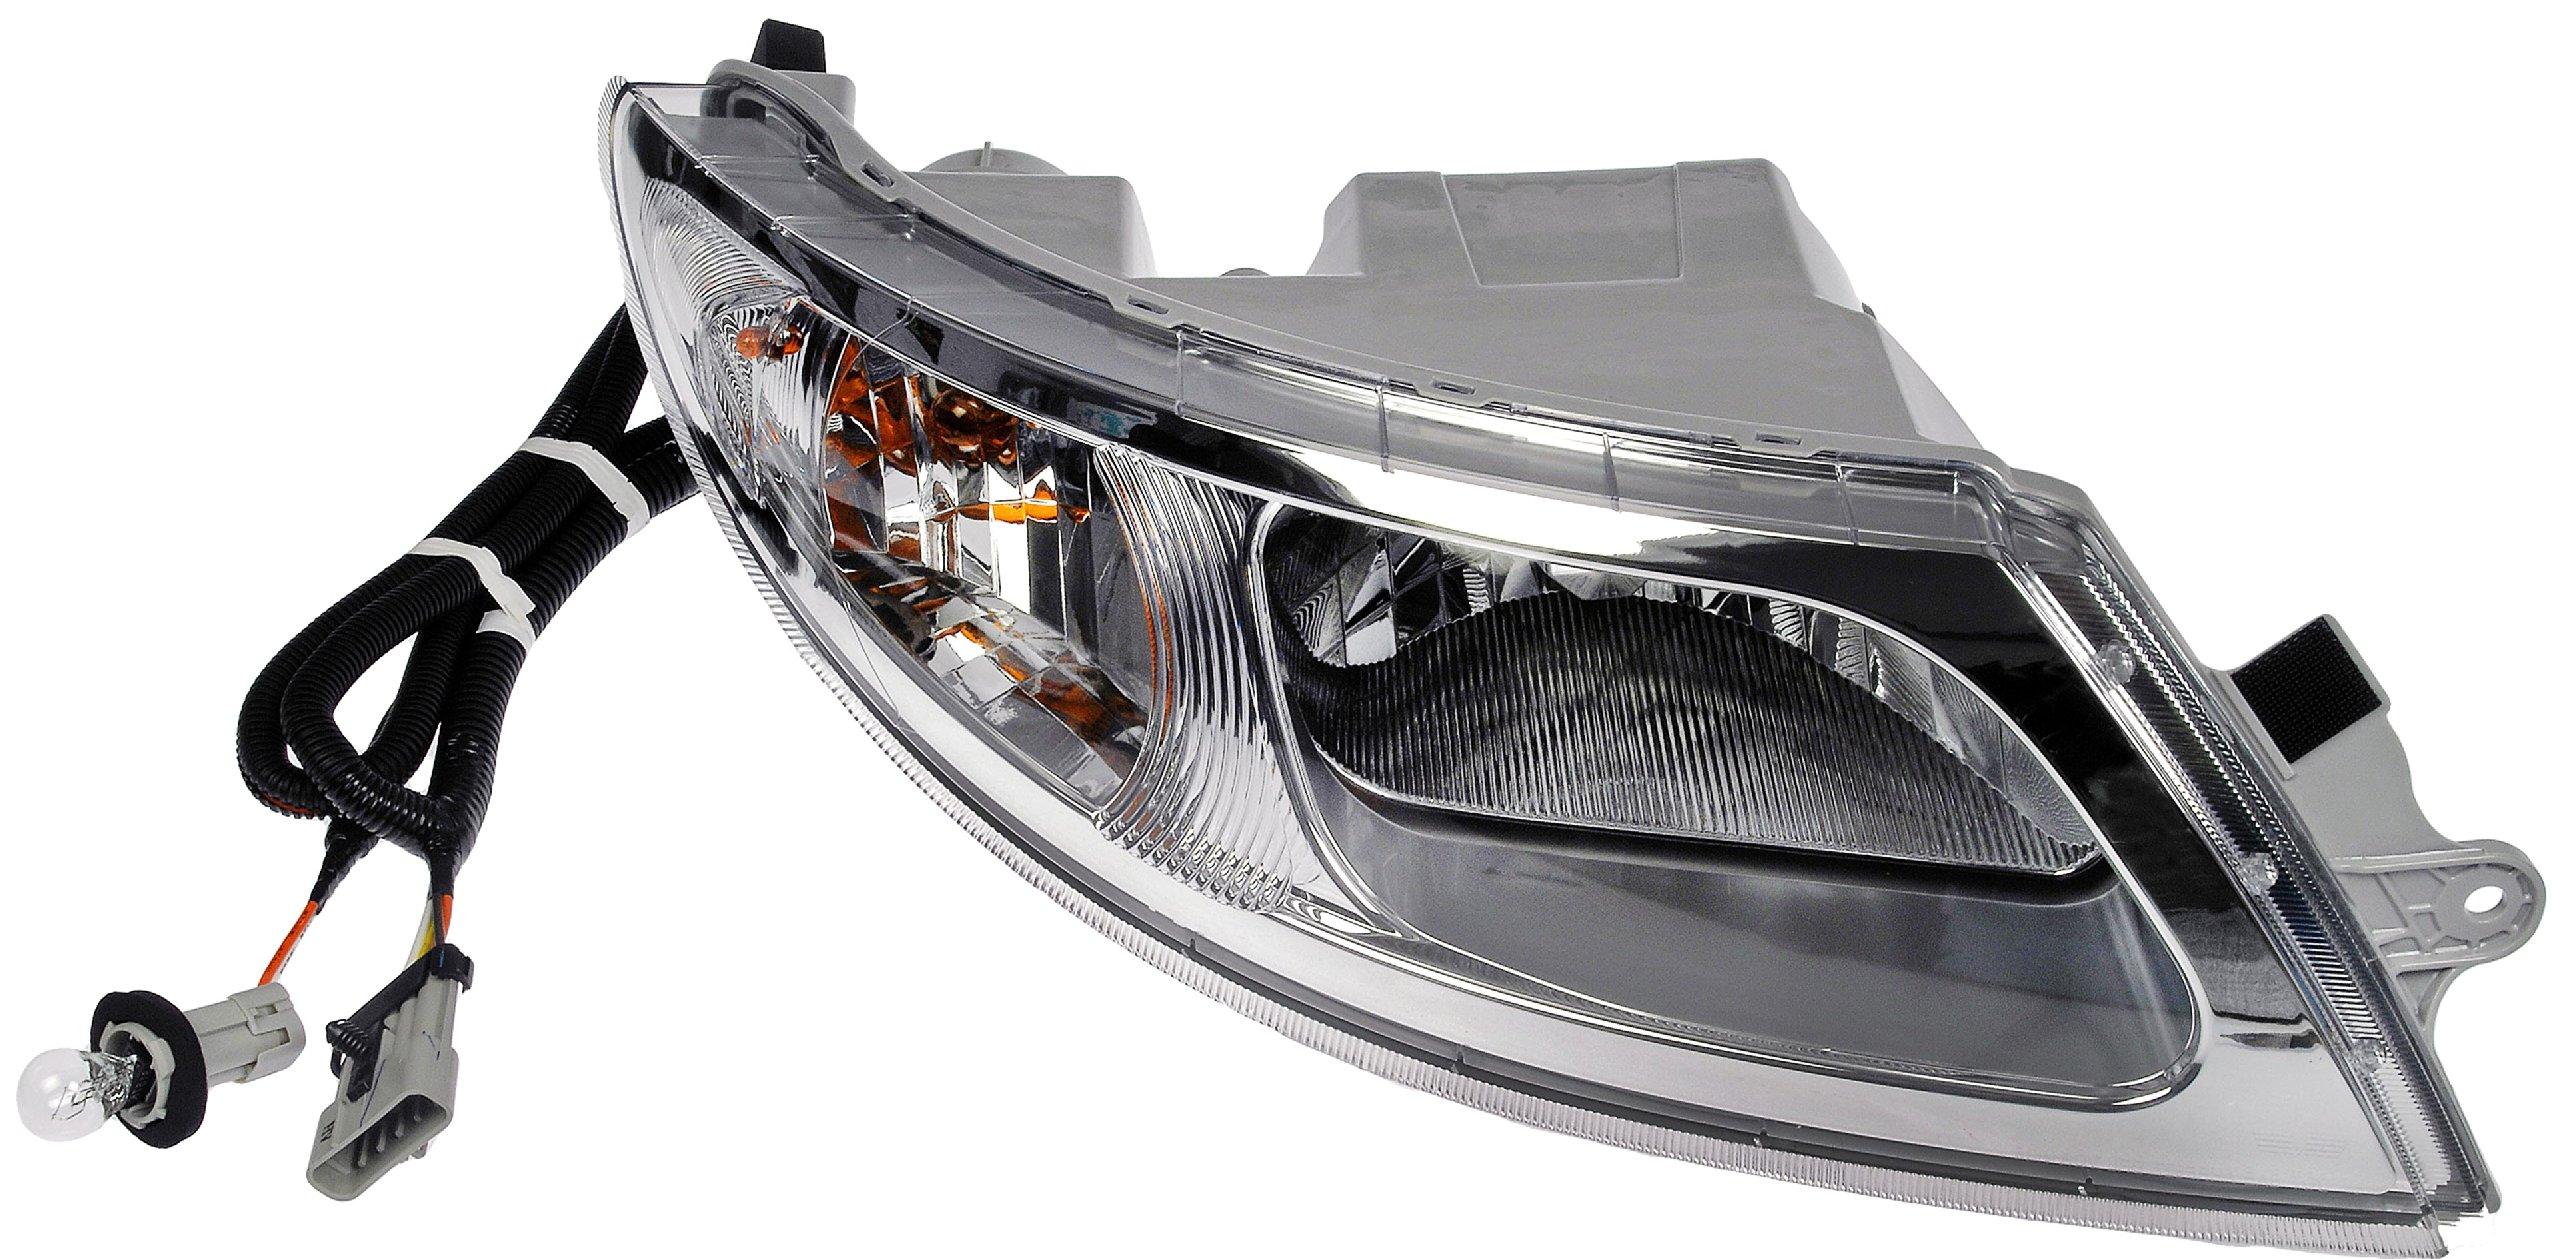 Dorman 888-5109 Passenger Side Headlight Assembly For Select IC/IC Corporation/International Models